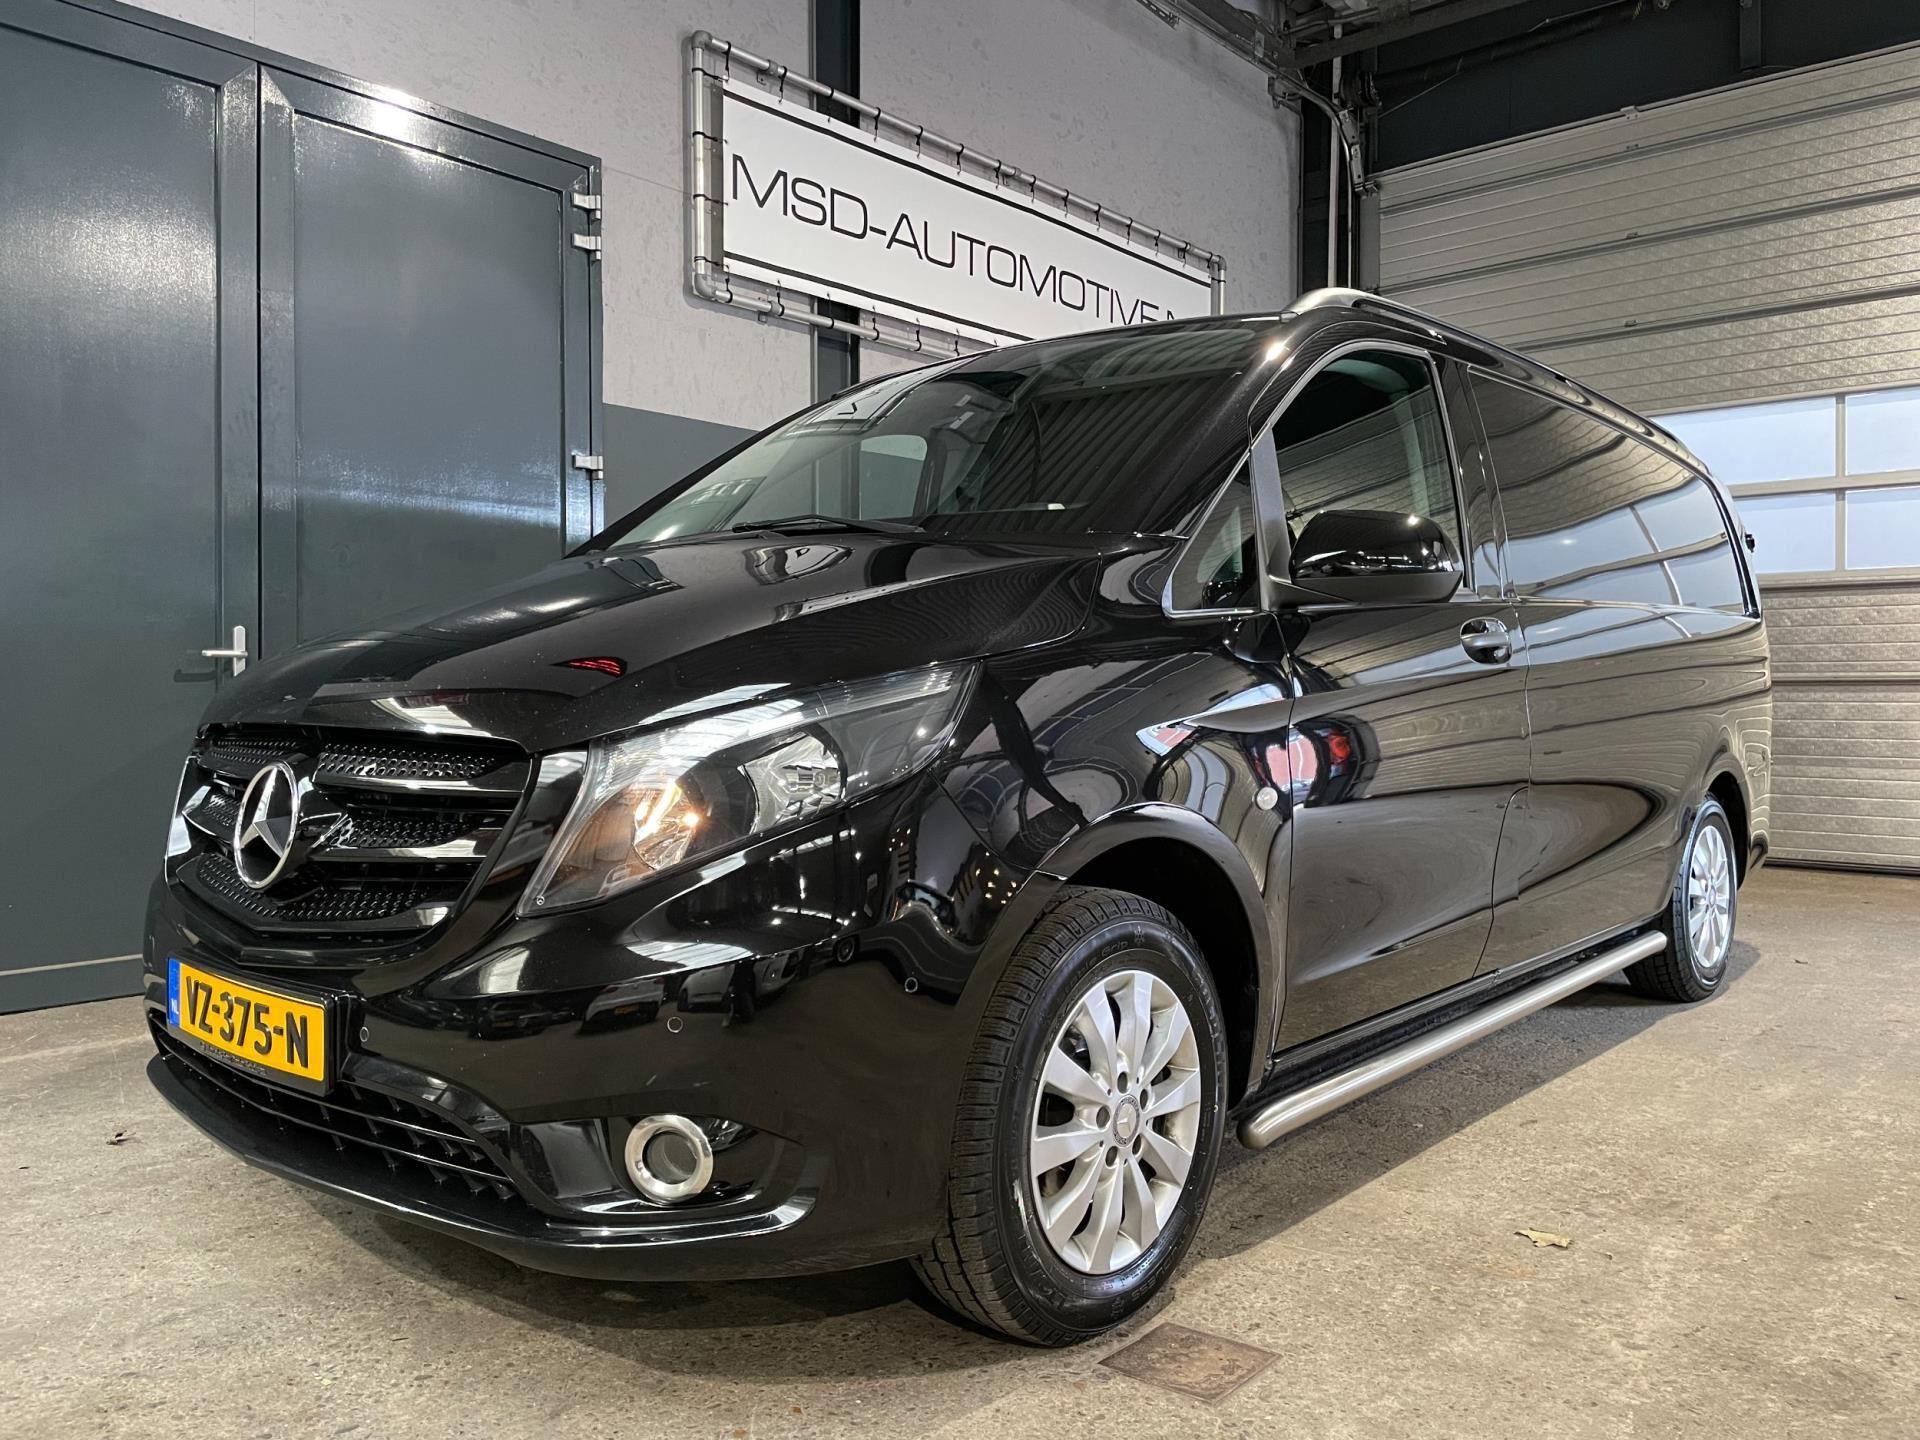 Mercedes-Benz Vito occasion - MSD Automotive